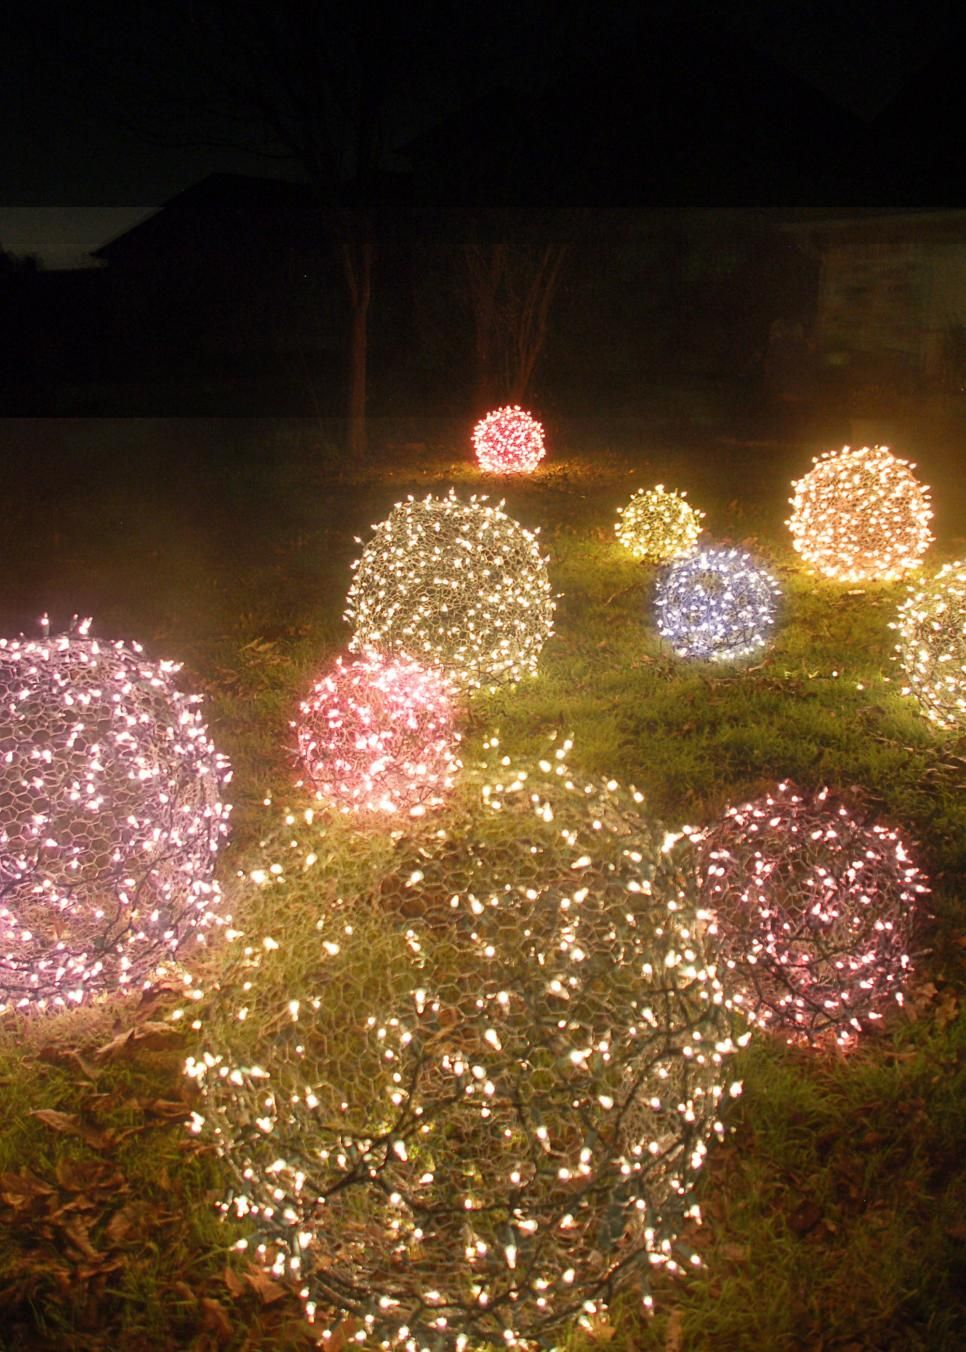 DIY Christmas Light Balls | Lawn ornaments, Lawn and Ornament